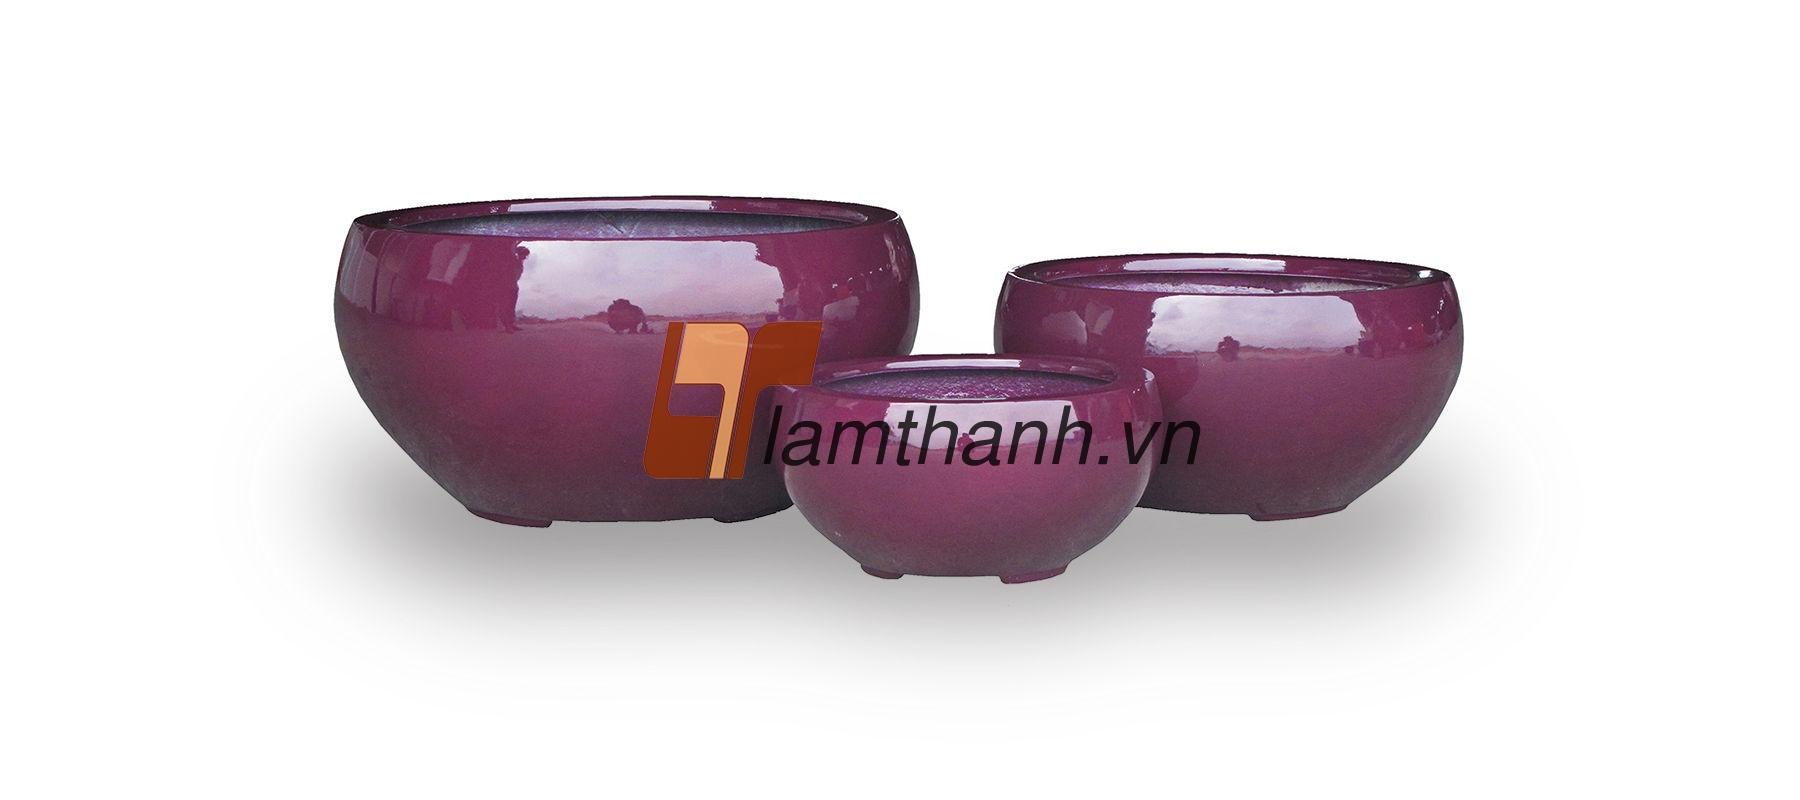 vietnam polystone, fiberglass 10